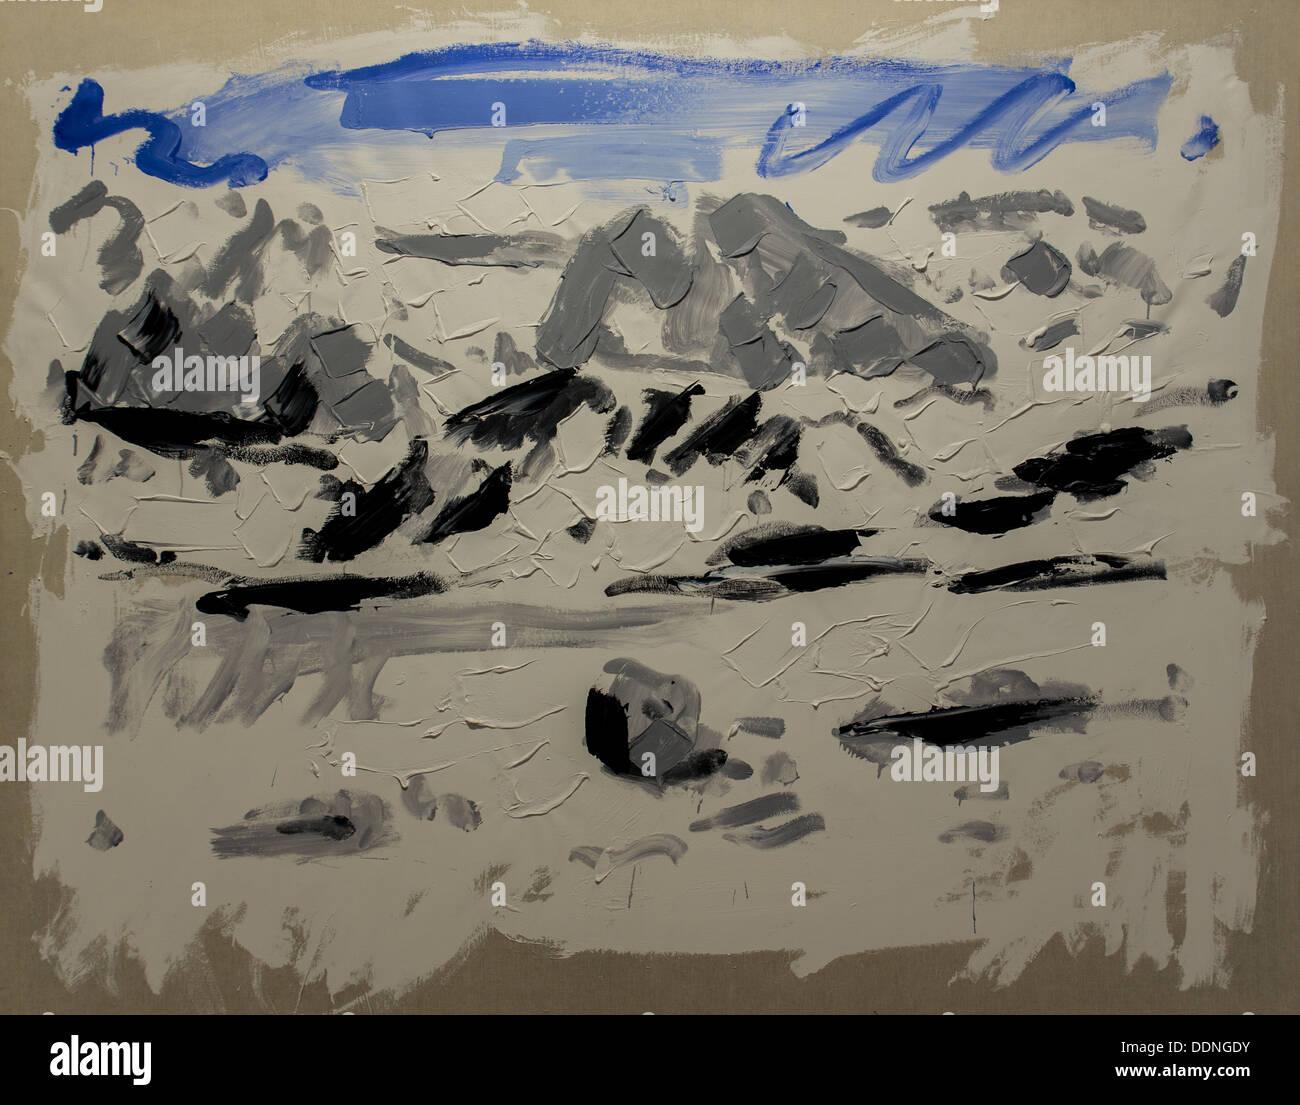 20e siècle - Berg 1/1, 1981 - Christian Lindow Philippe Sauvan-Magnet / Active Museum Photo Stock